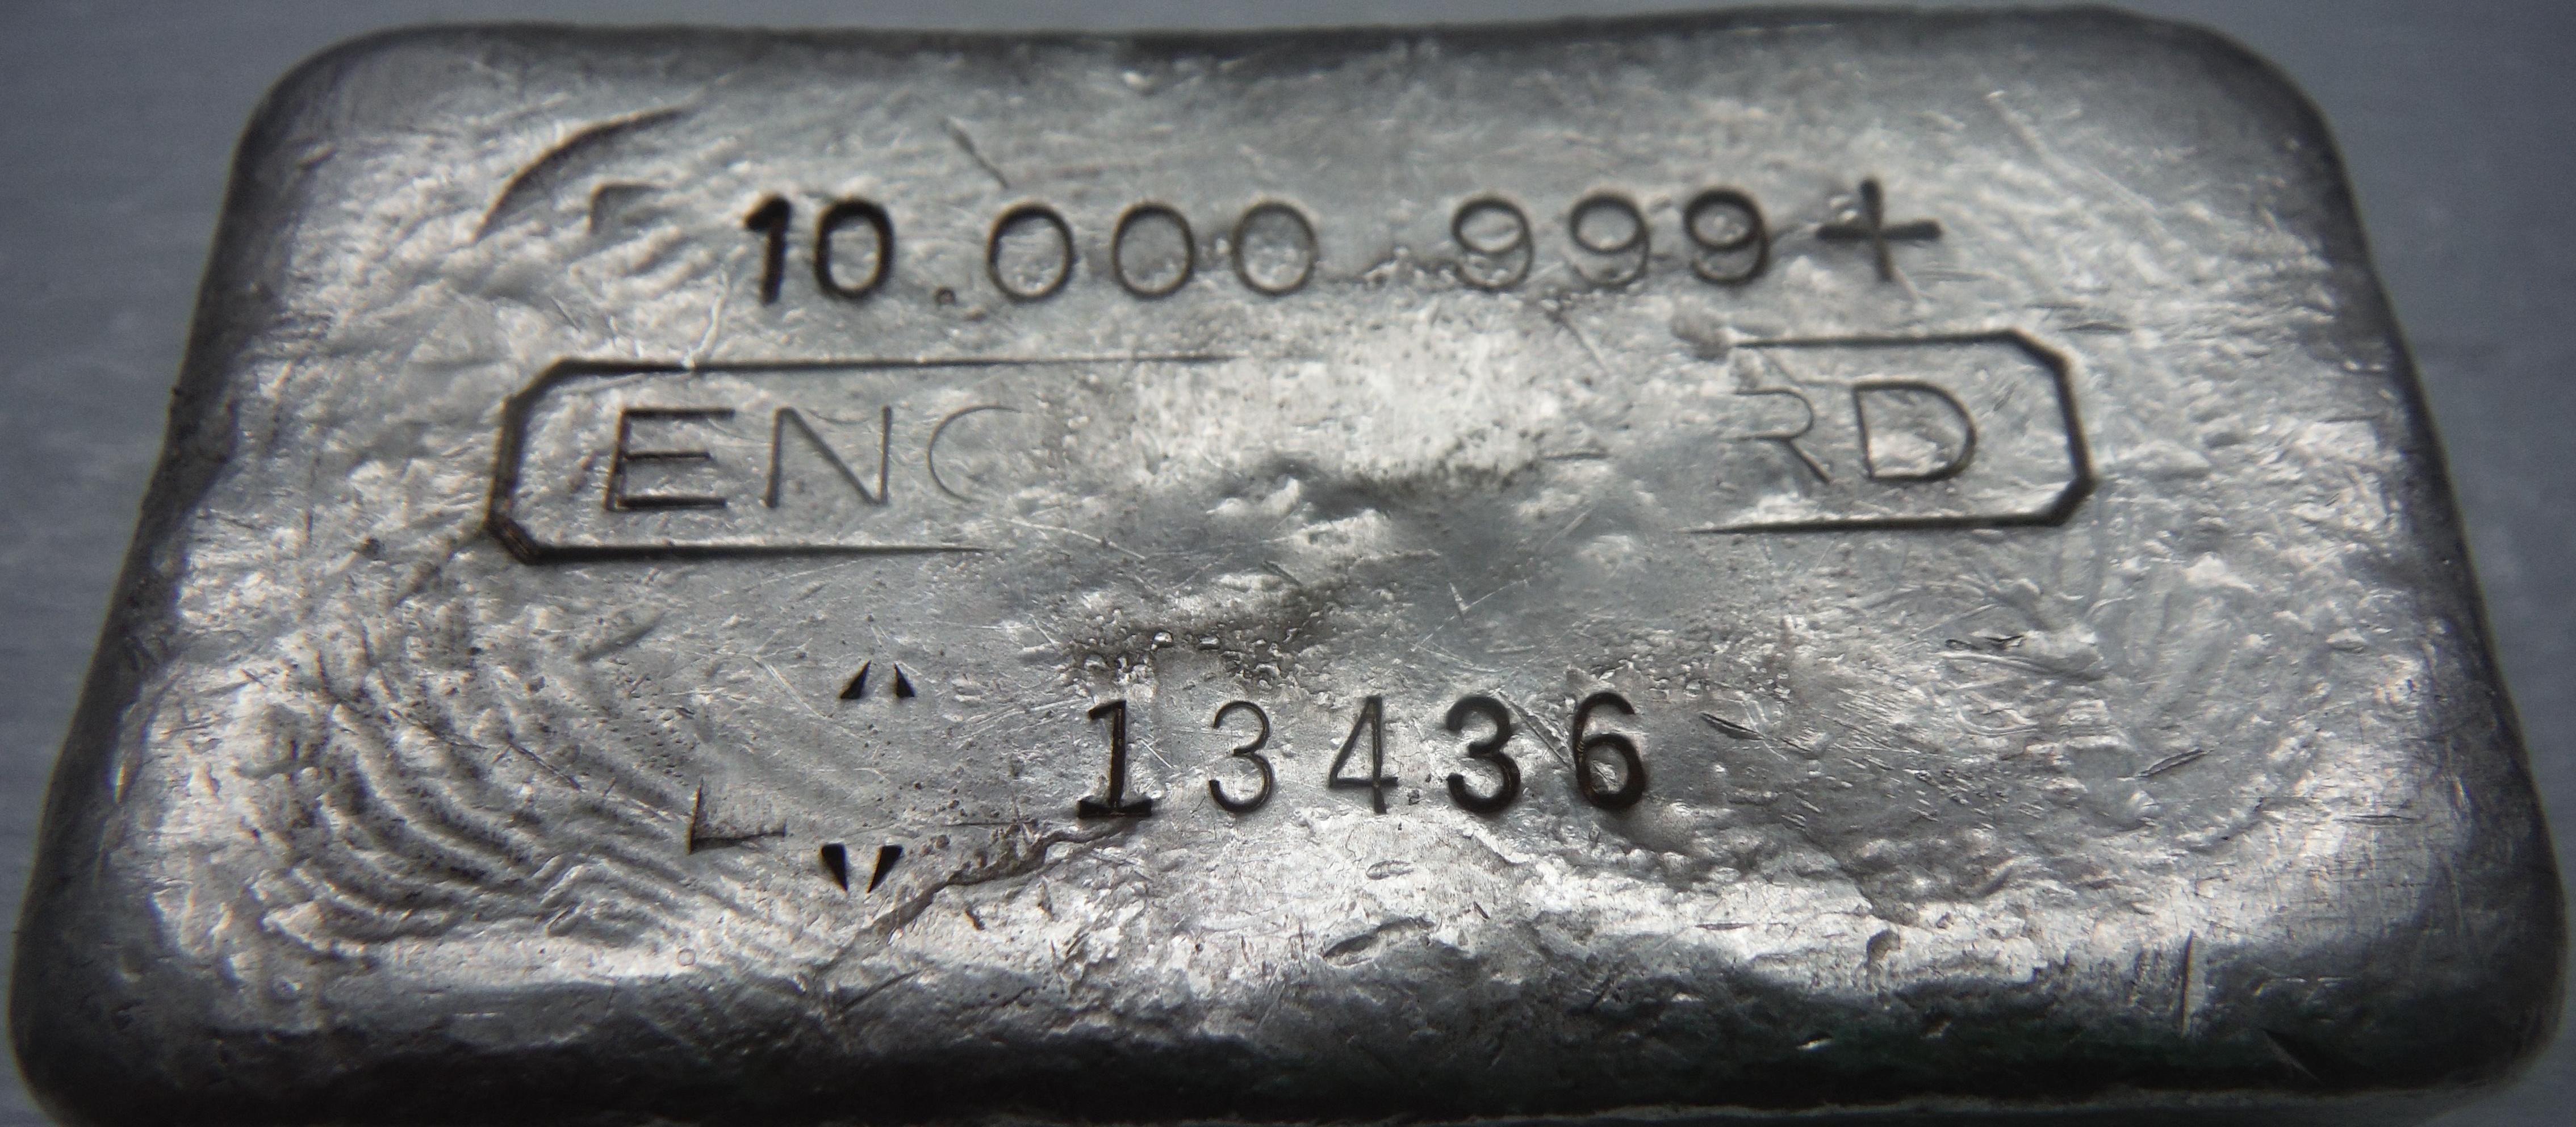 st8jvt80k6j01